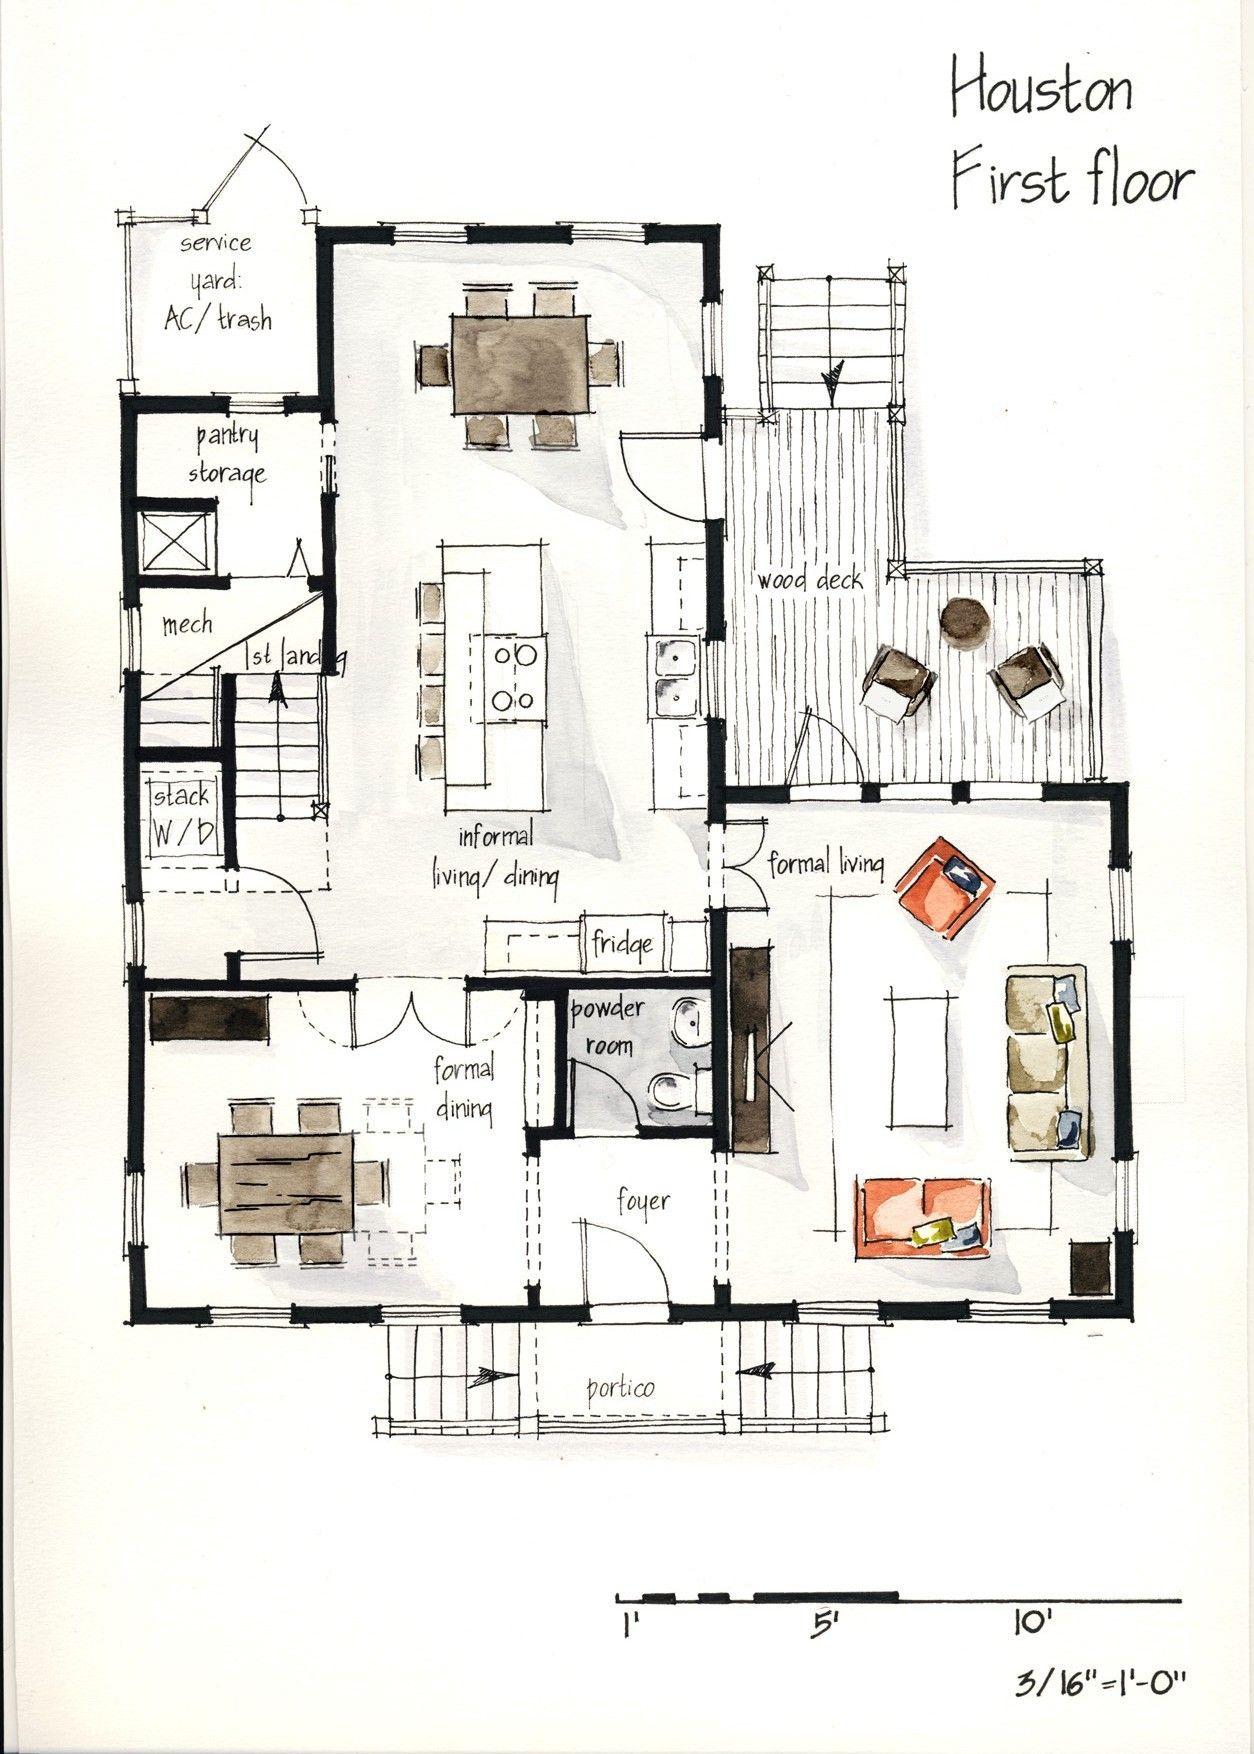 Real Estate Watercolor 2d Floor Plans Part 1 On Behance Interior Architecture Drawing Interior Design Plan Interior Design Sketches